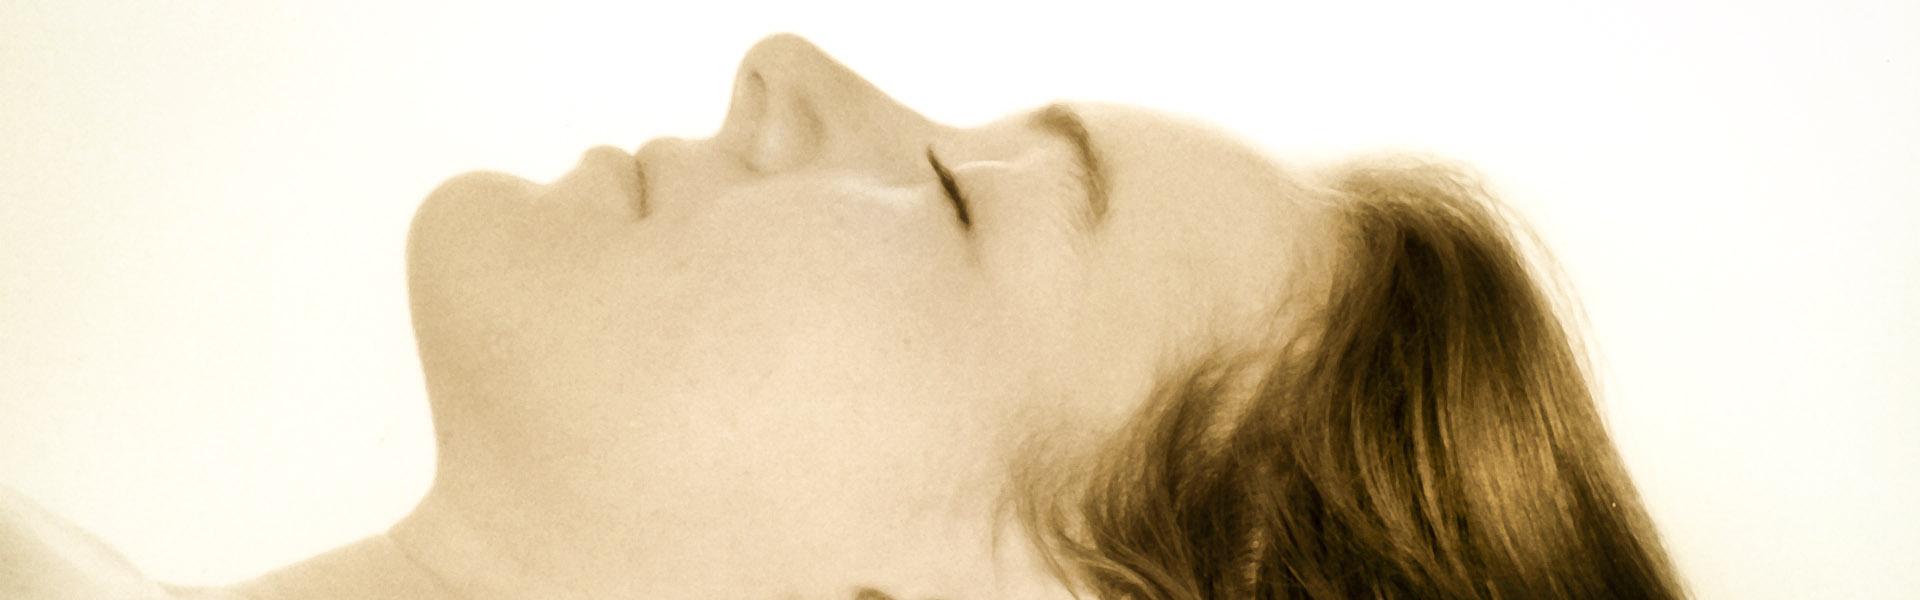 Craniosacrale Therapie – Craniosacrale Behandlung einer Frau